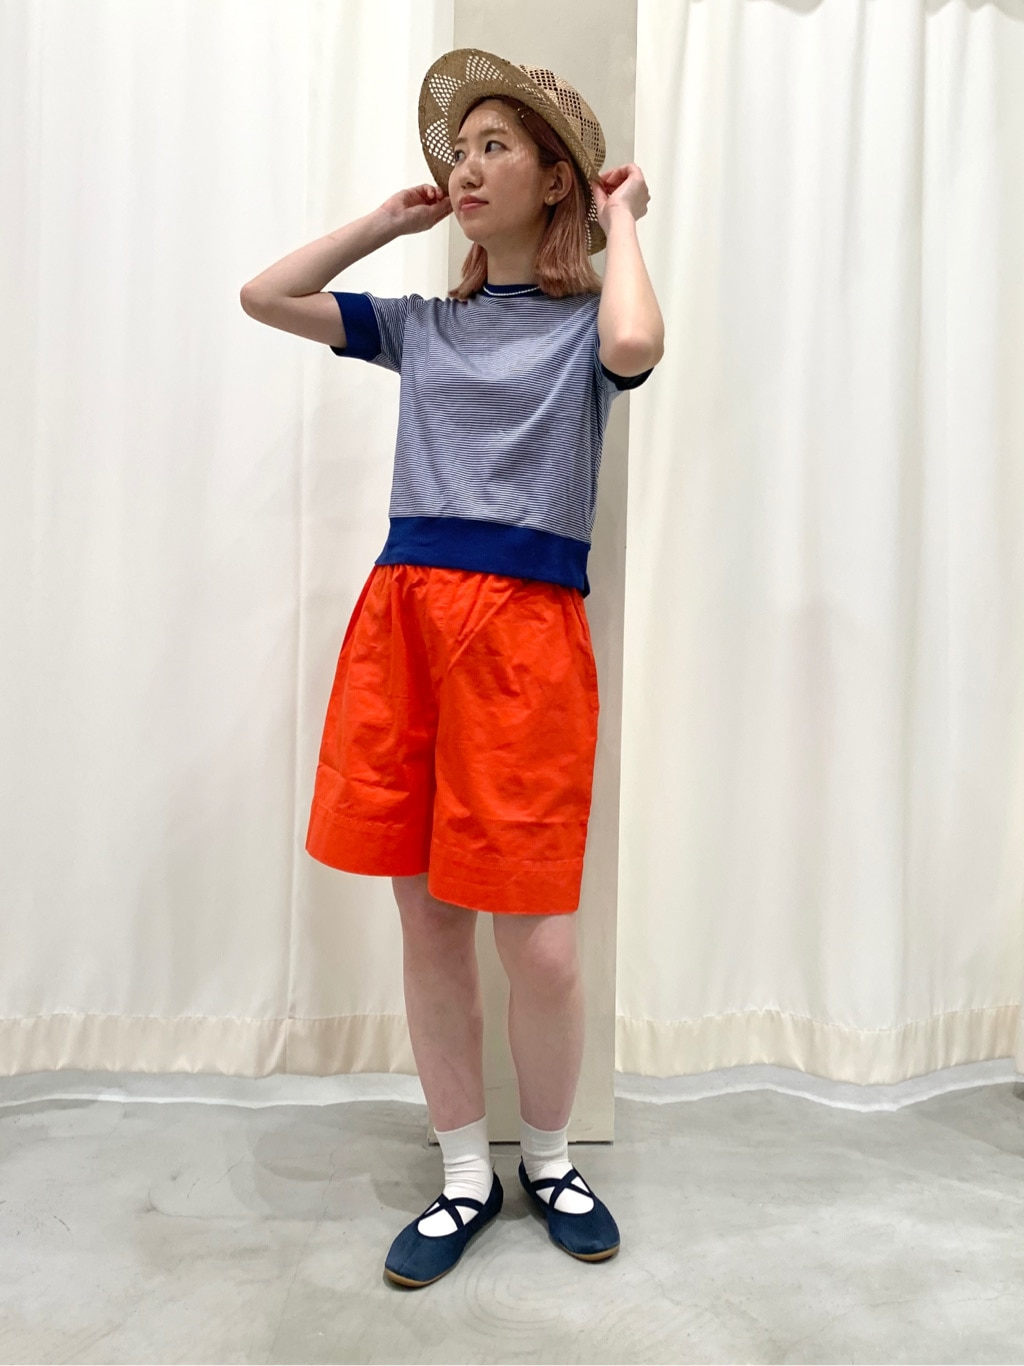 - CHILD WOMAN CHILD WOMAN , PAR ICI 東京スカイツリータウン・ソラマチ 身長:160cm 2021.05.15